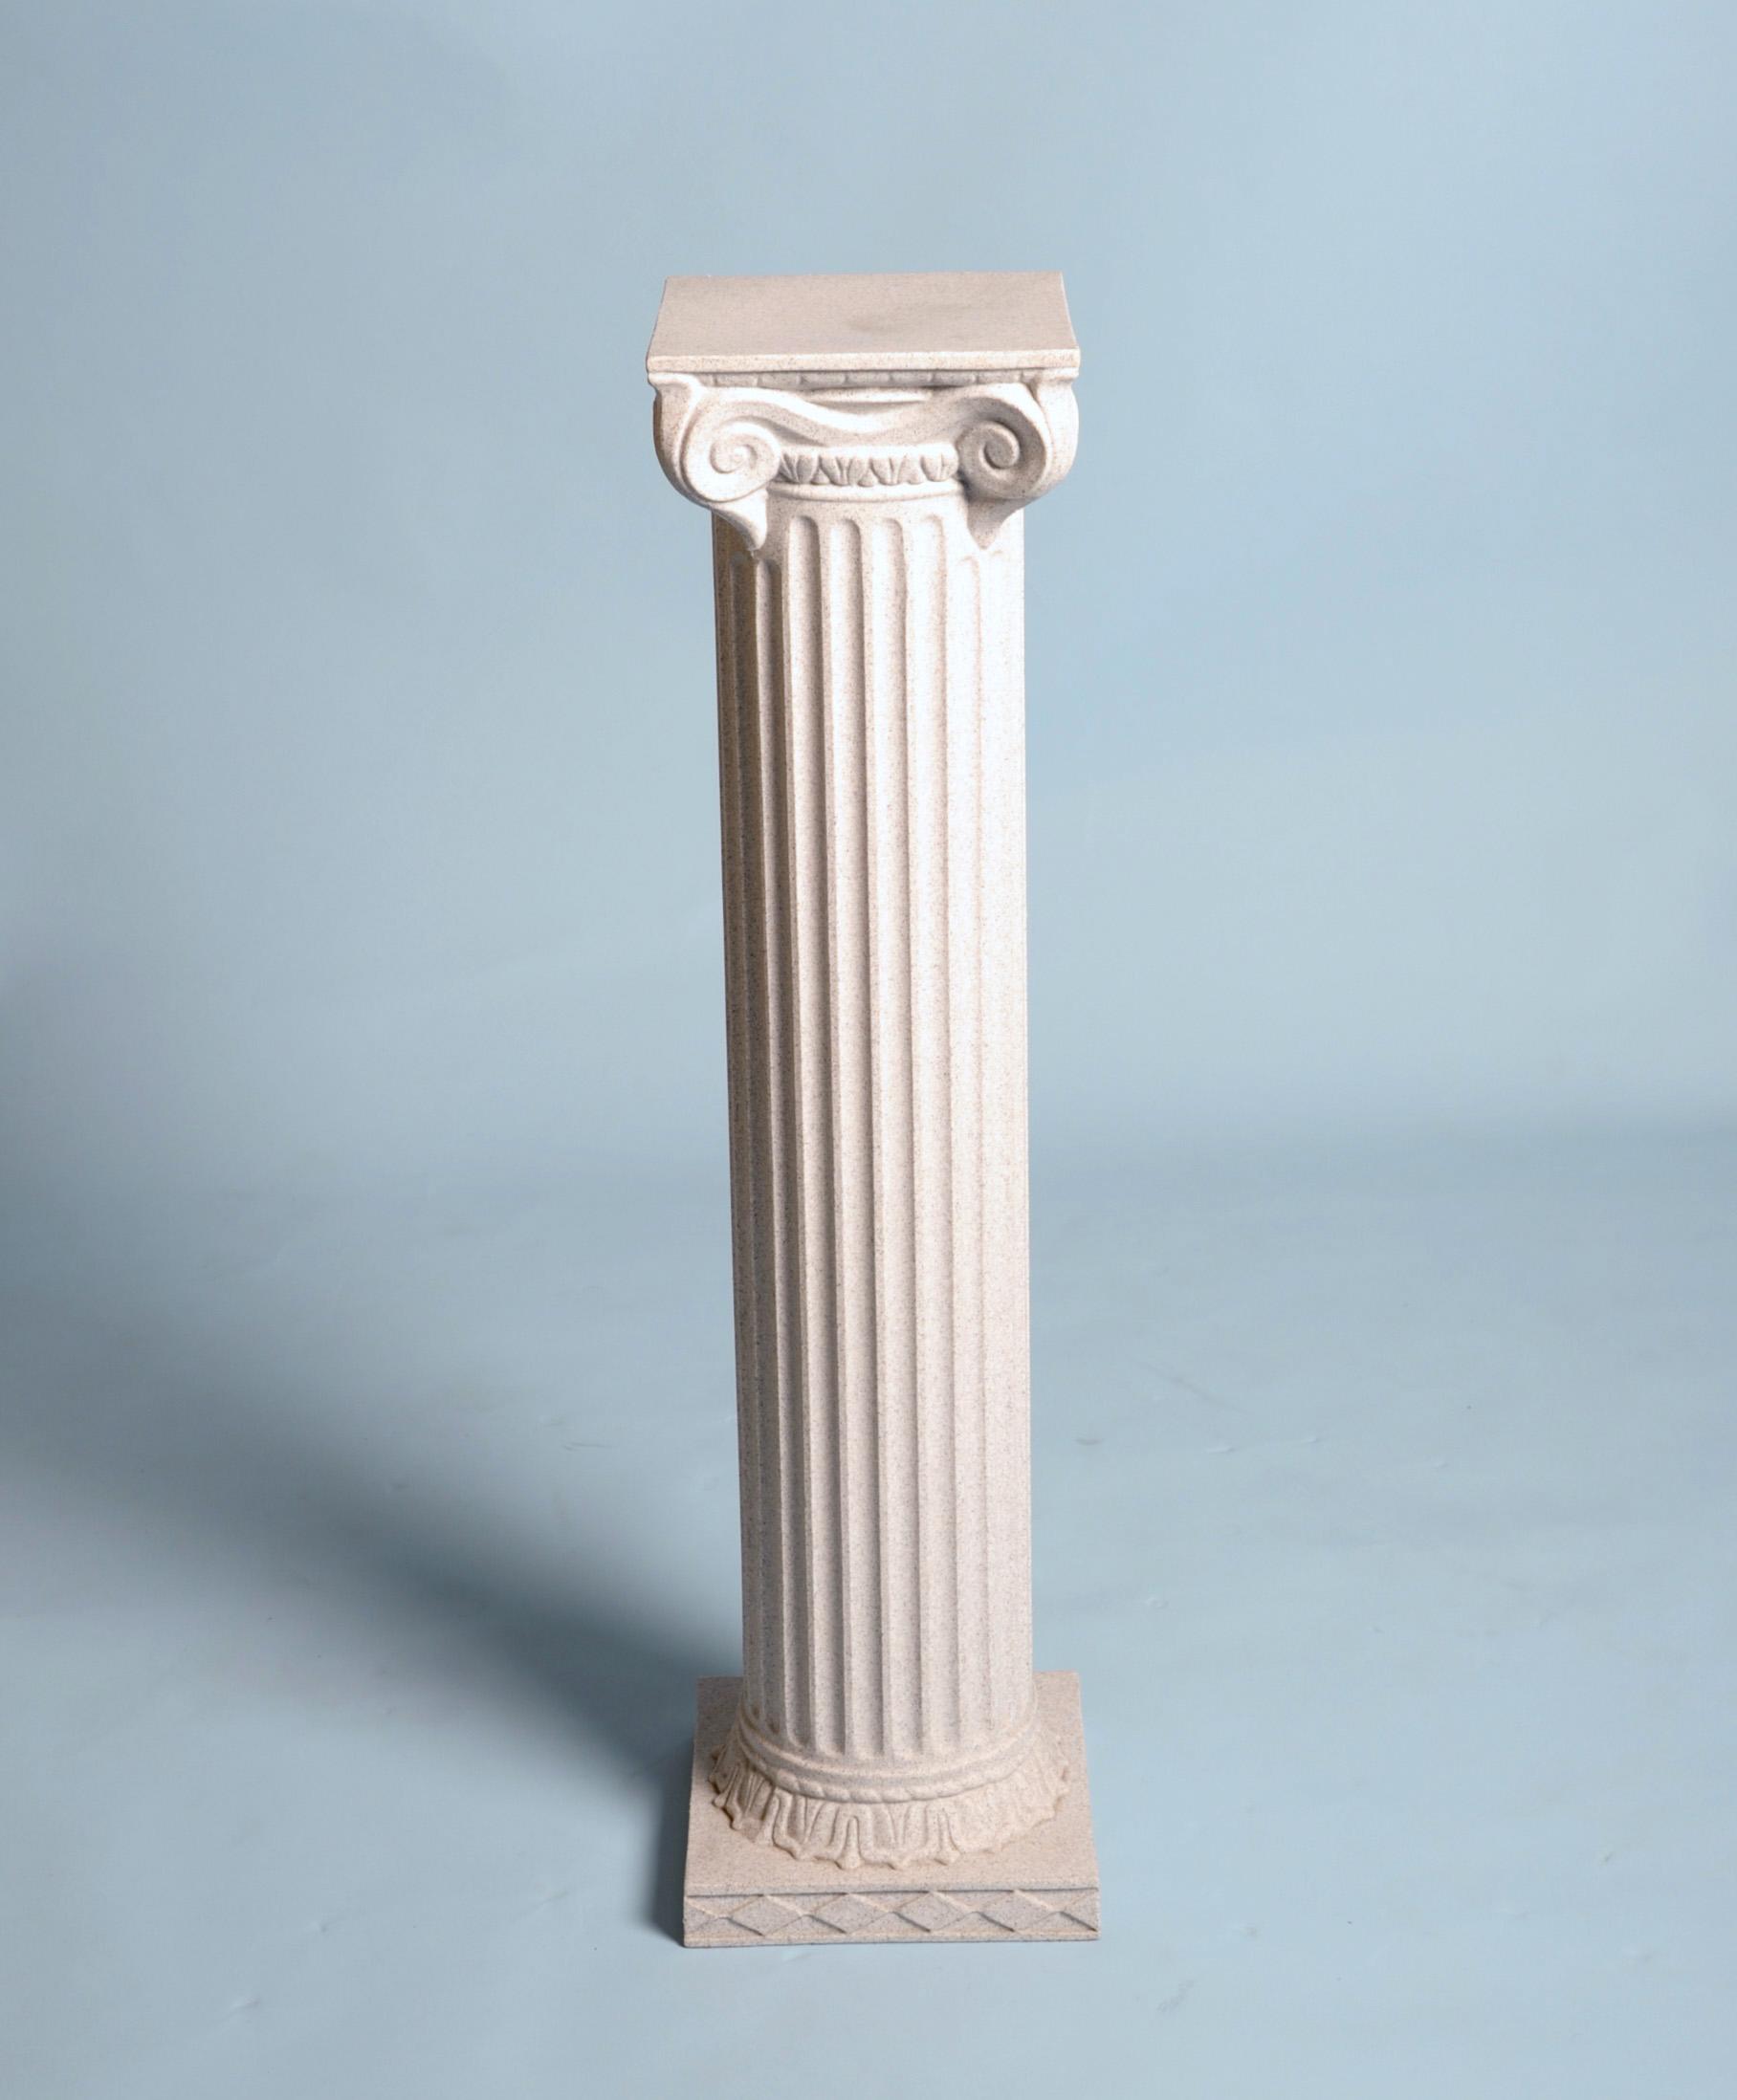 Roman column granite resin 40 hx10 d arizona party Decorative colums